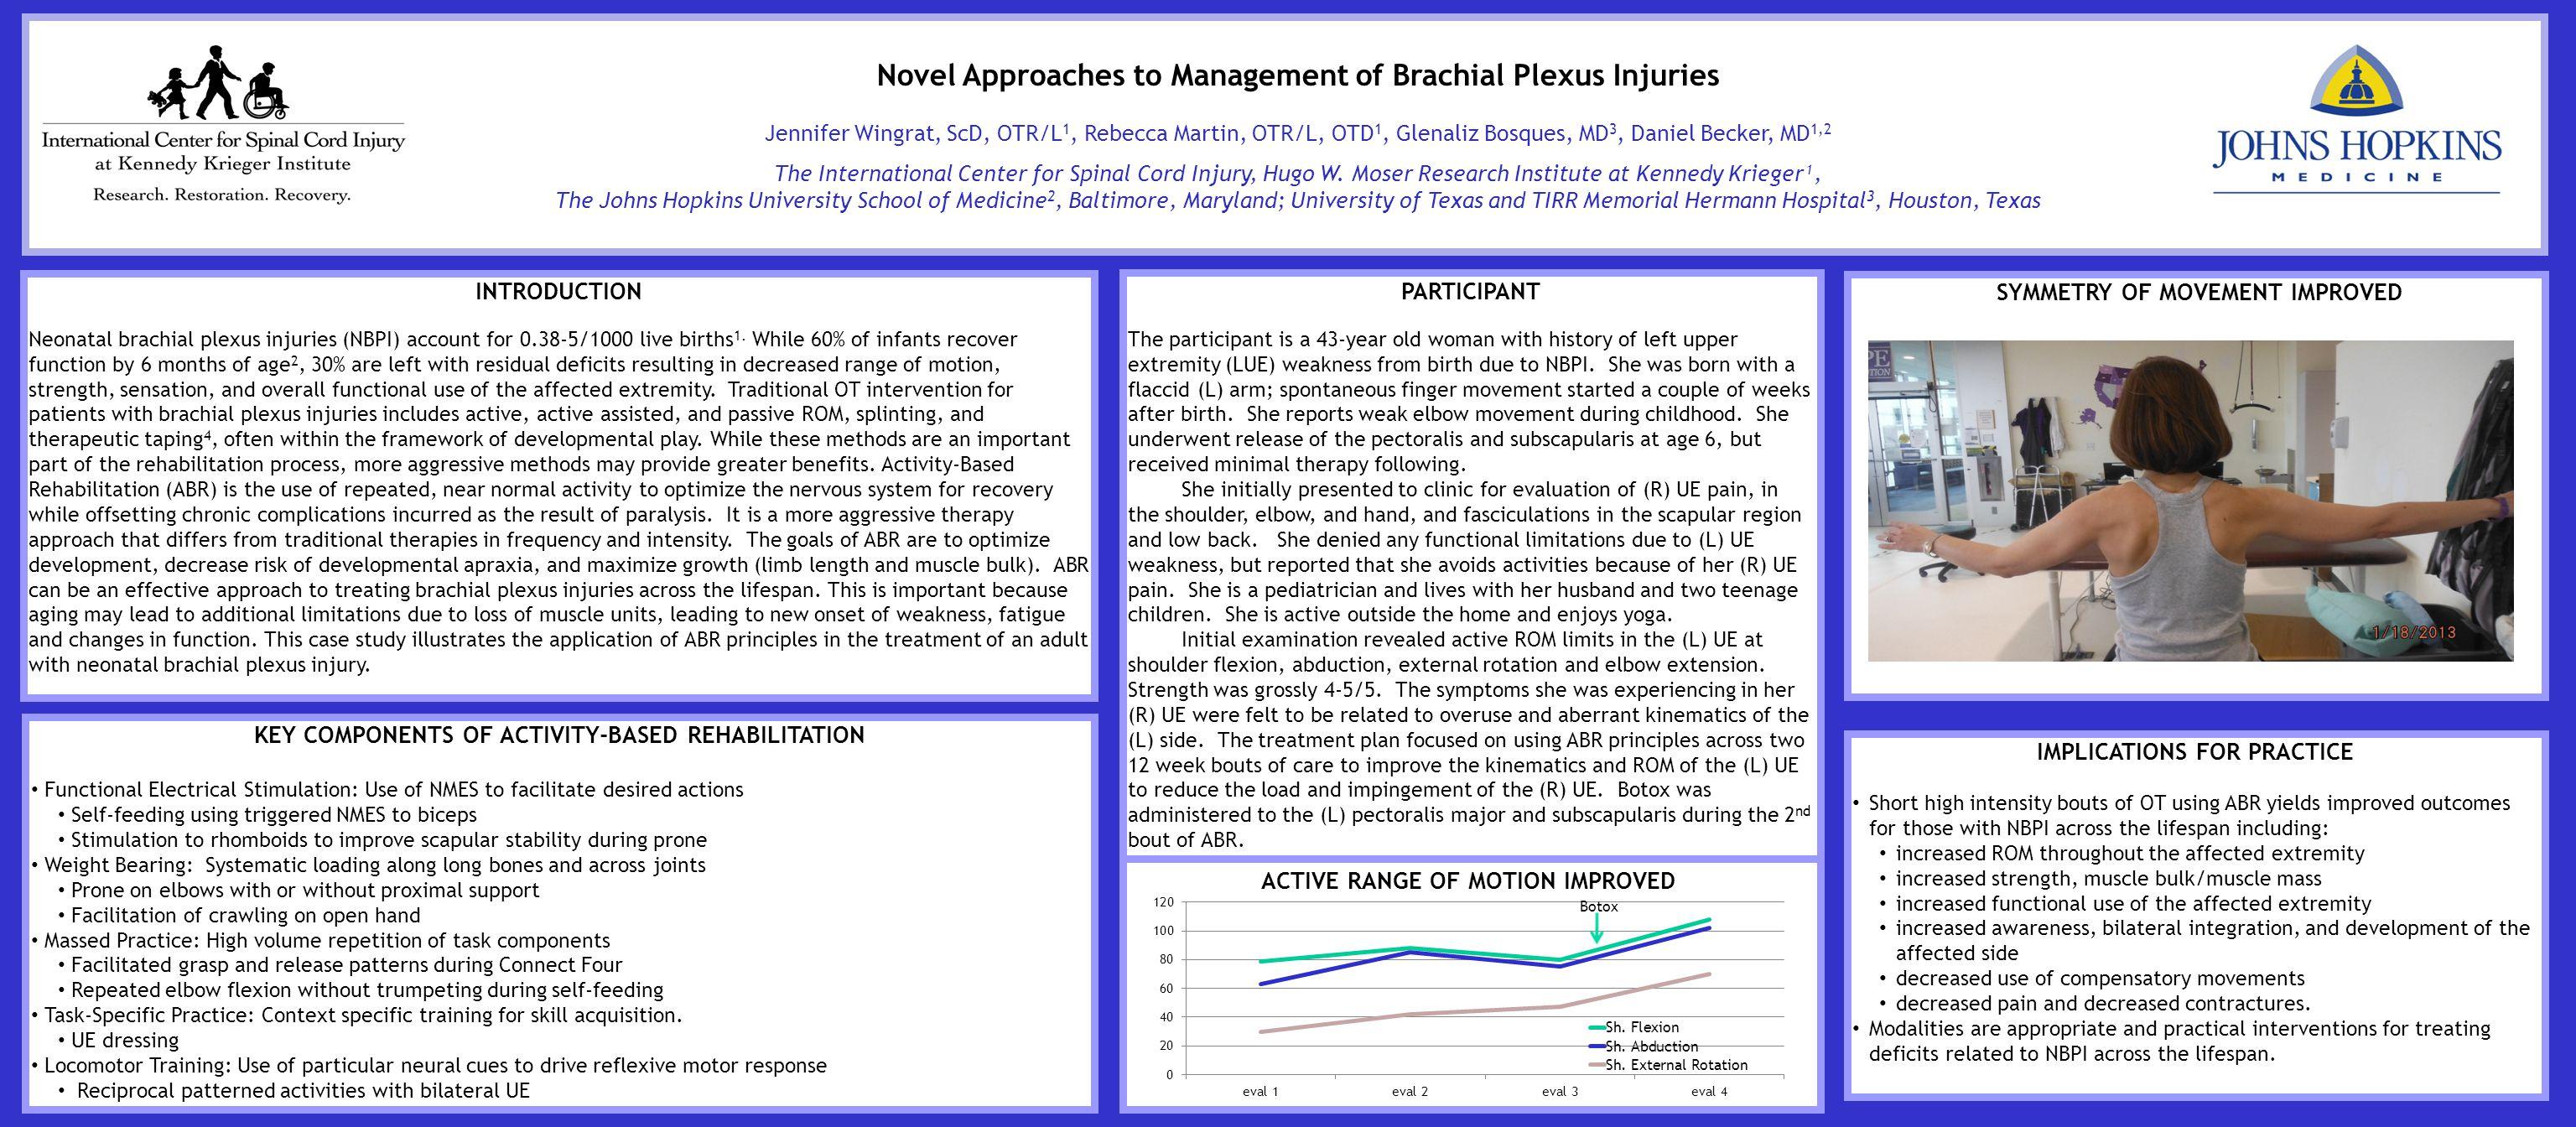 Novel Approaches to Management of Brachial Plexus Injuries Jennifer Wingrat, ScD, OTR/L 1, Rebecca Martin, OTR/L, OTD 1, Glenaliz Bosques, MD 3, Daniel Becker, MD 1,2 The International Center for Spinal Cord Injury, Hugo W.